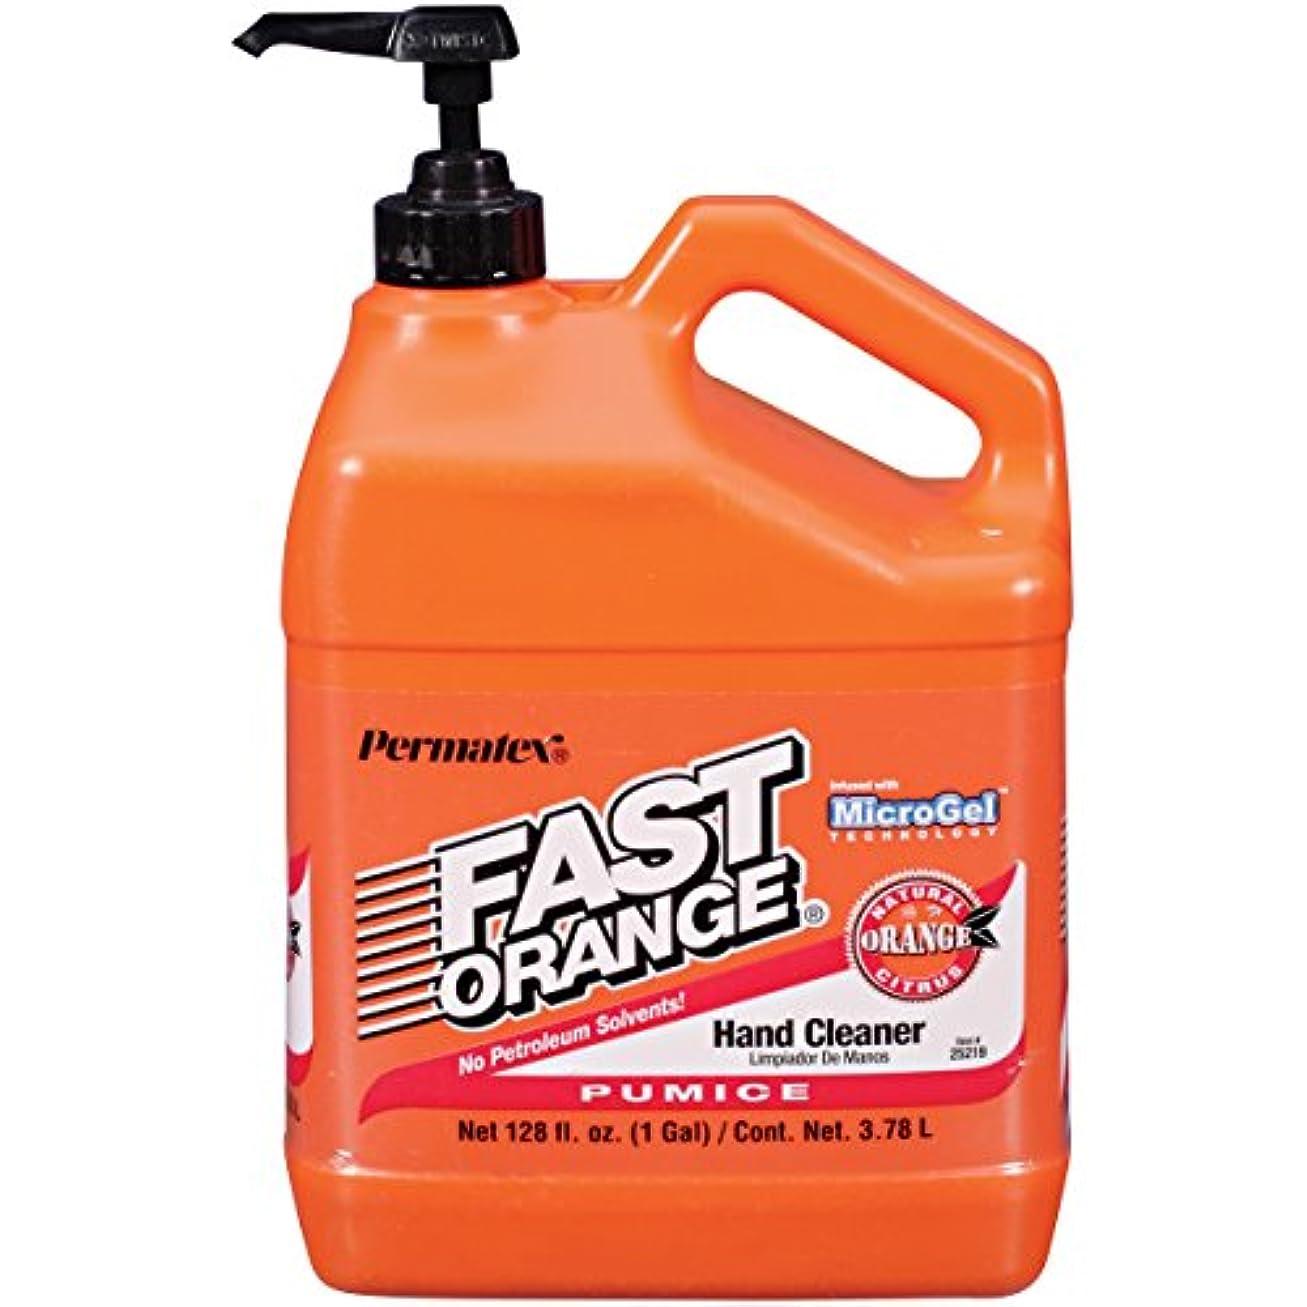 FAST ORANGE HAND CLEANERPUMICE 1 GALLON BOTTLE